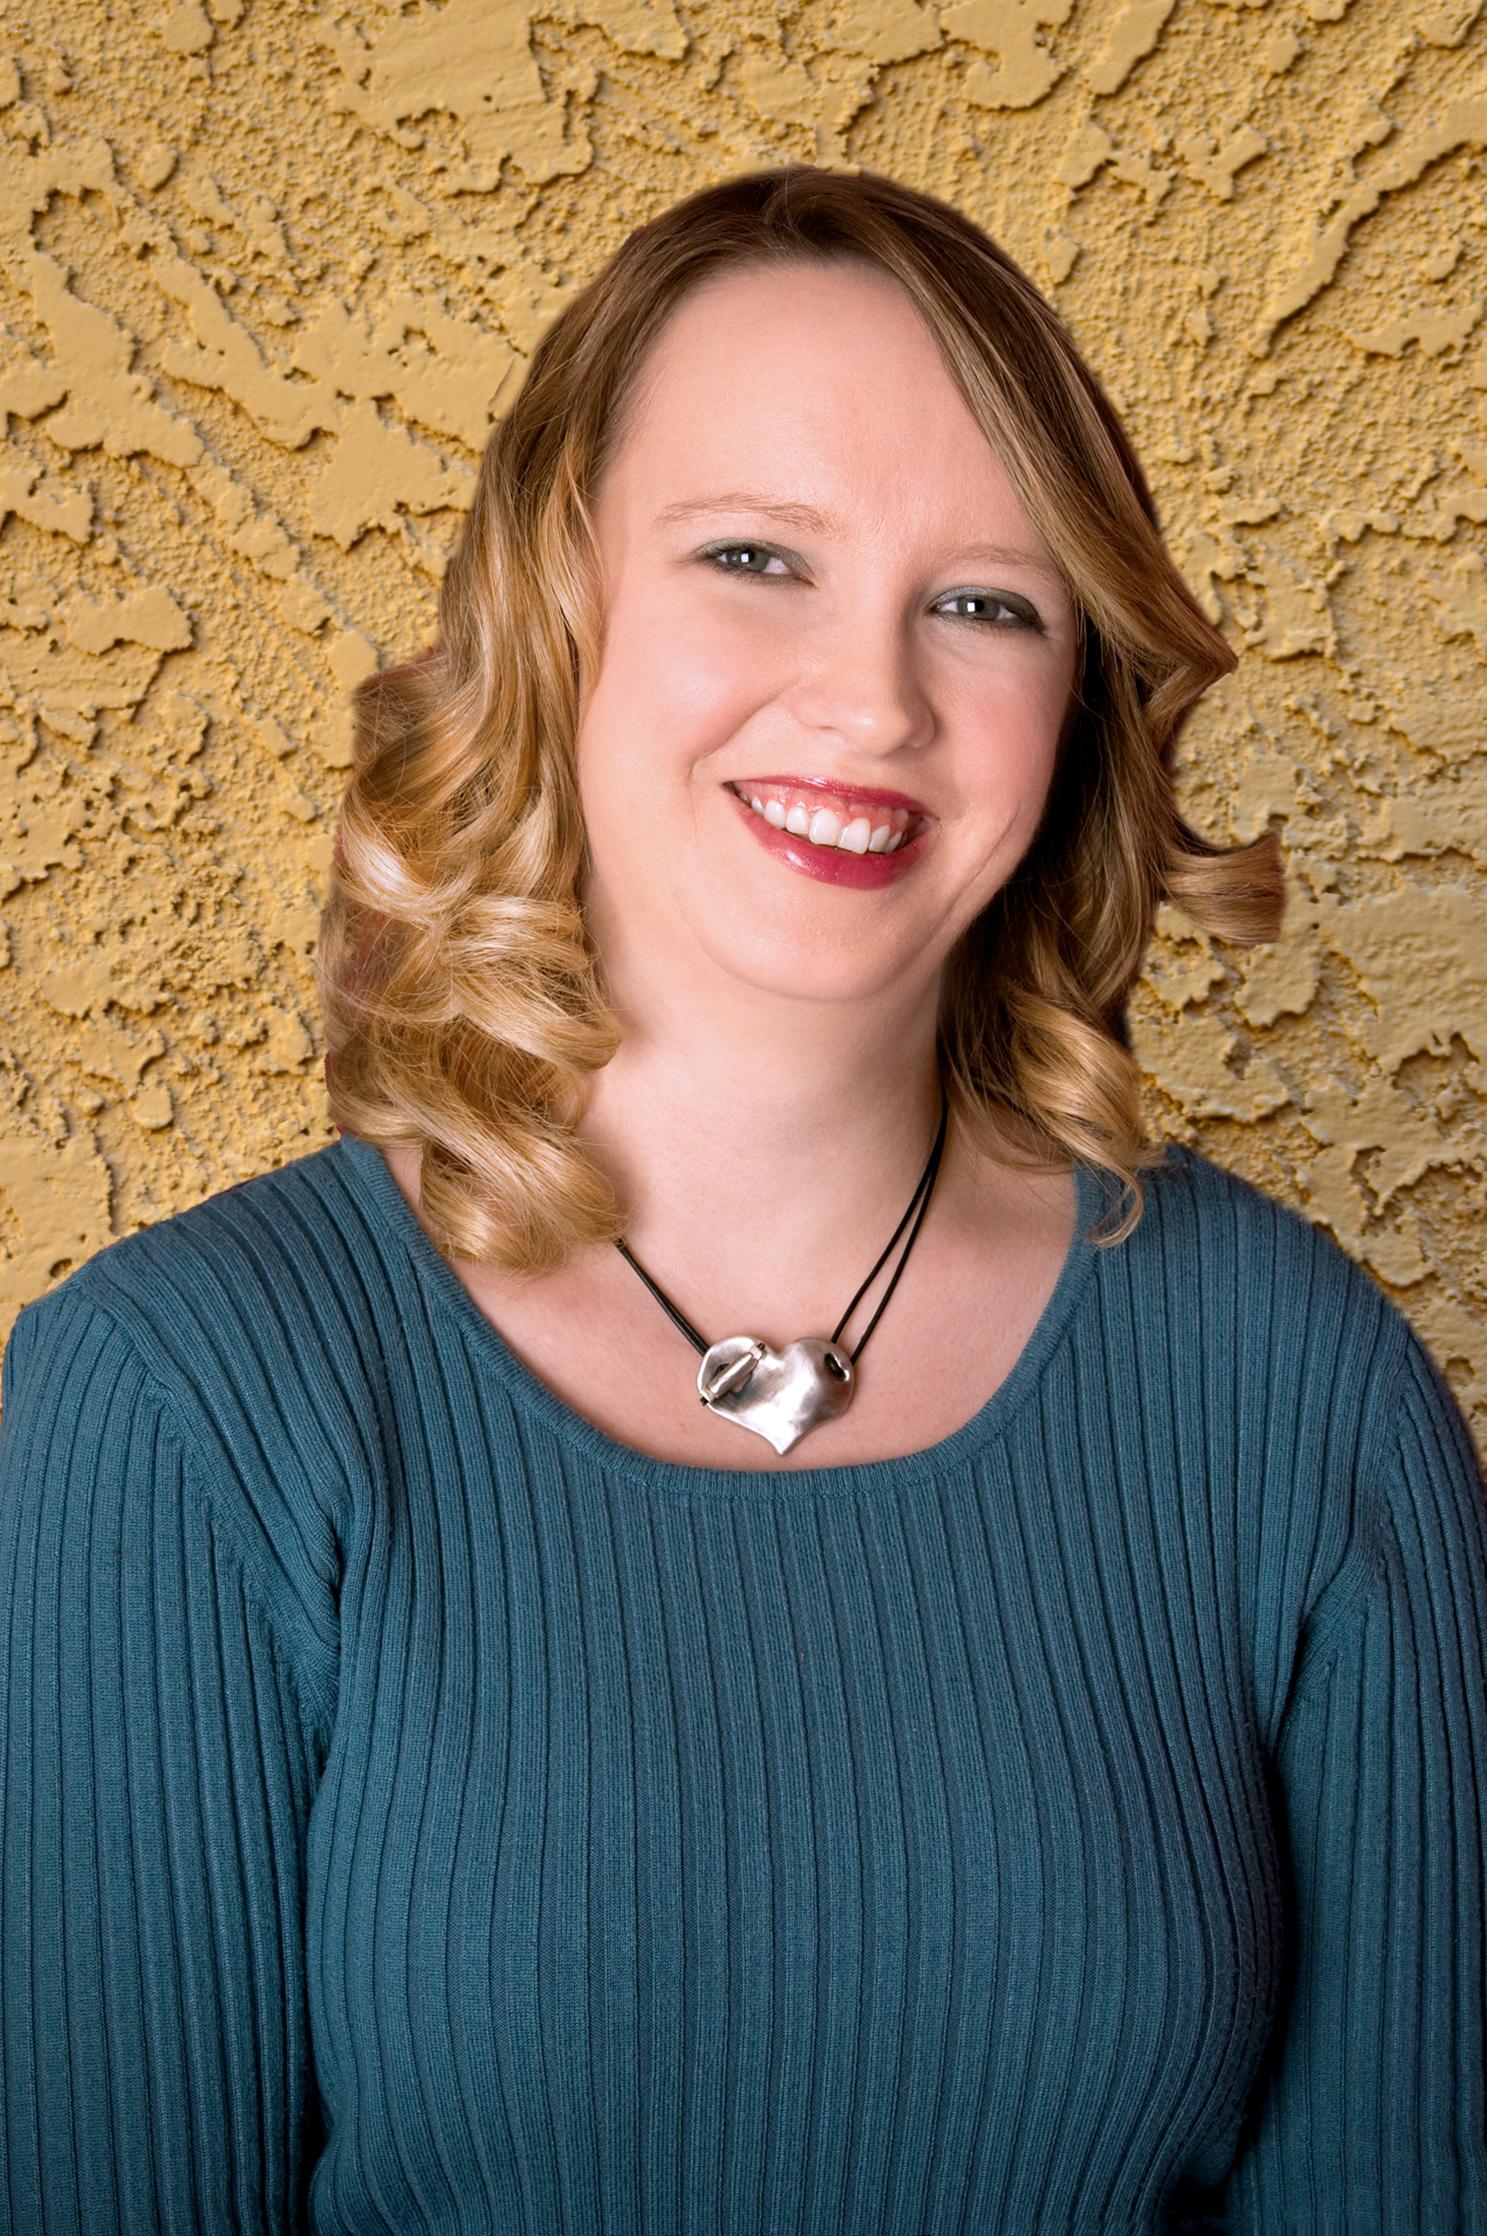 Heather Parrish